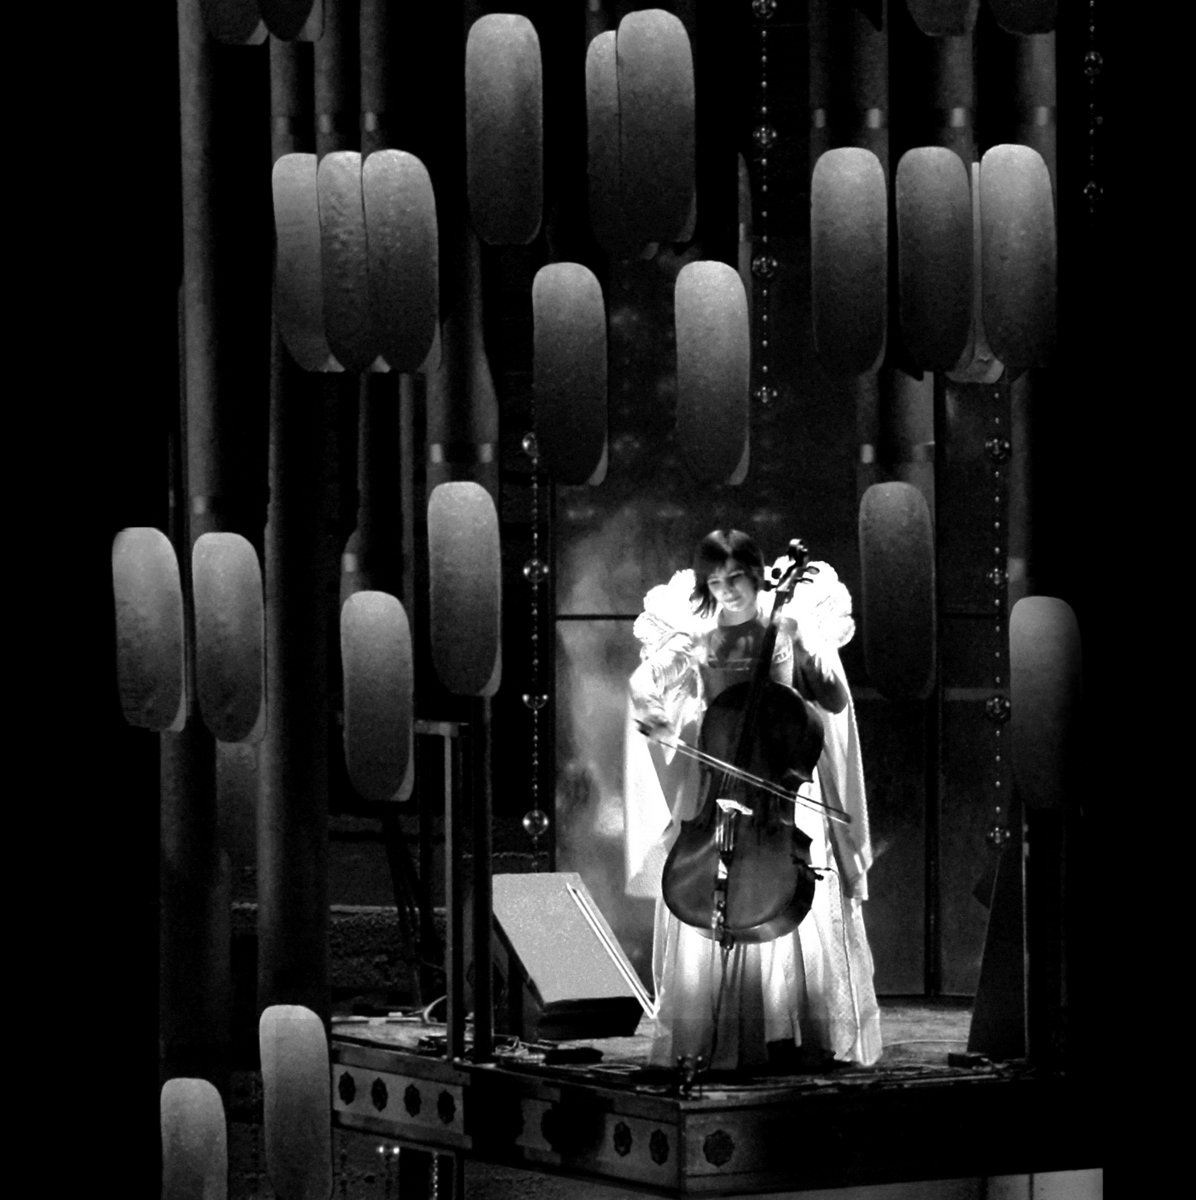 Glass vase cello case bonfire madigan discography reviewsmspy